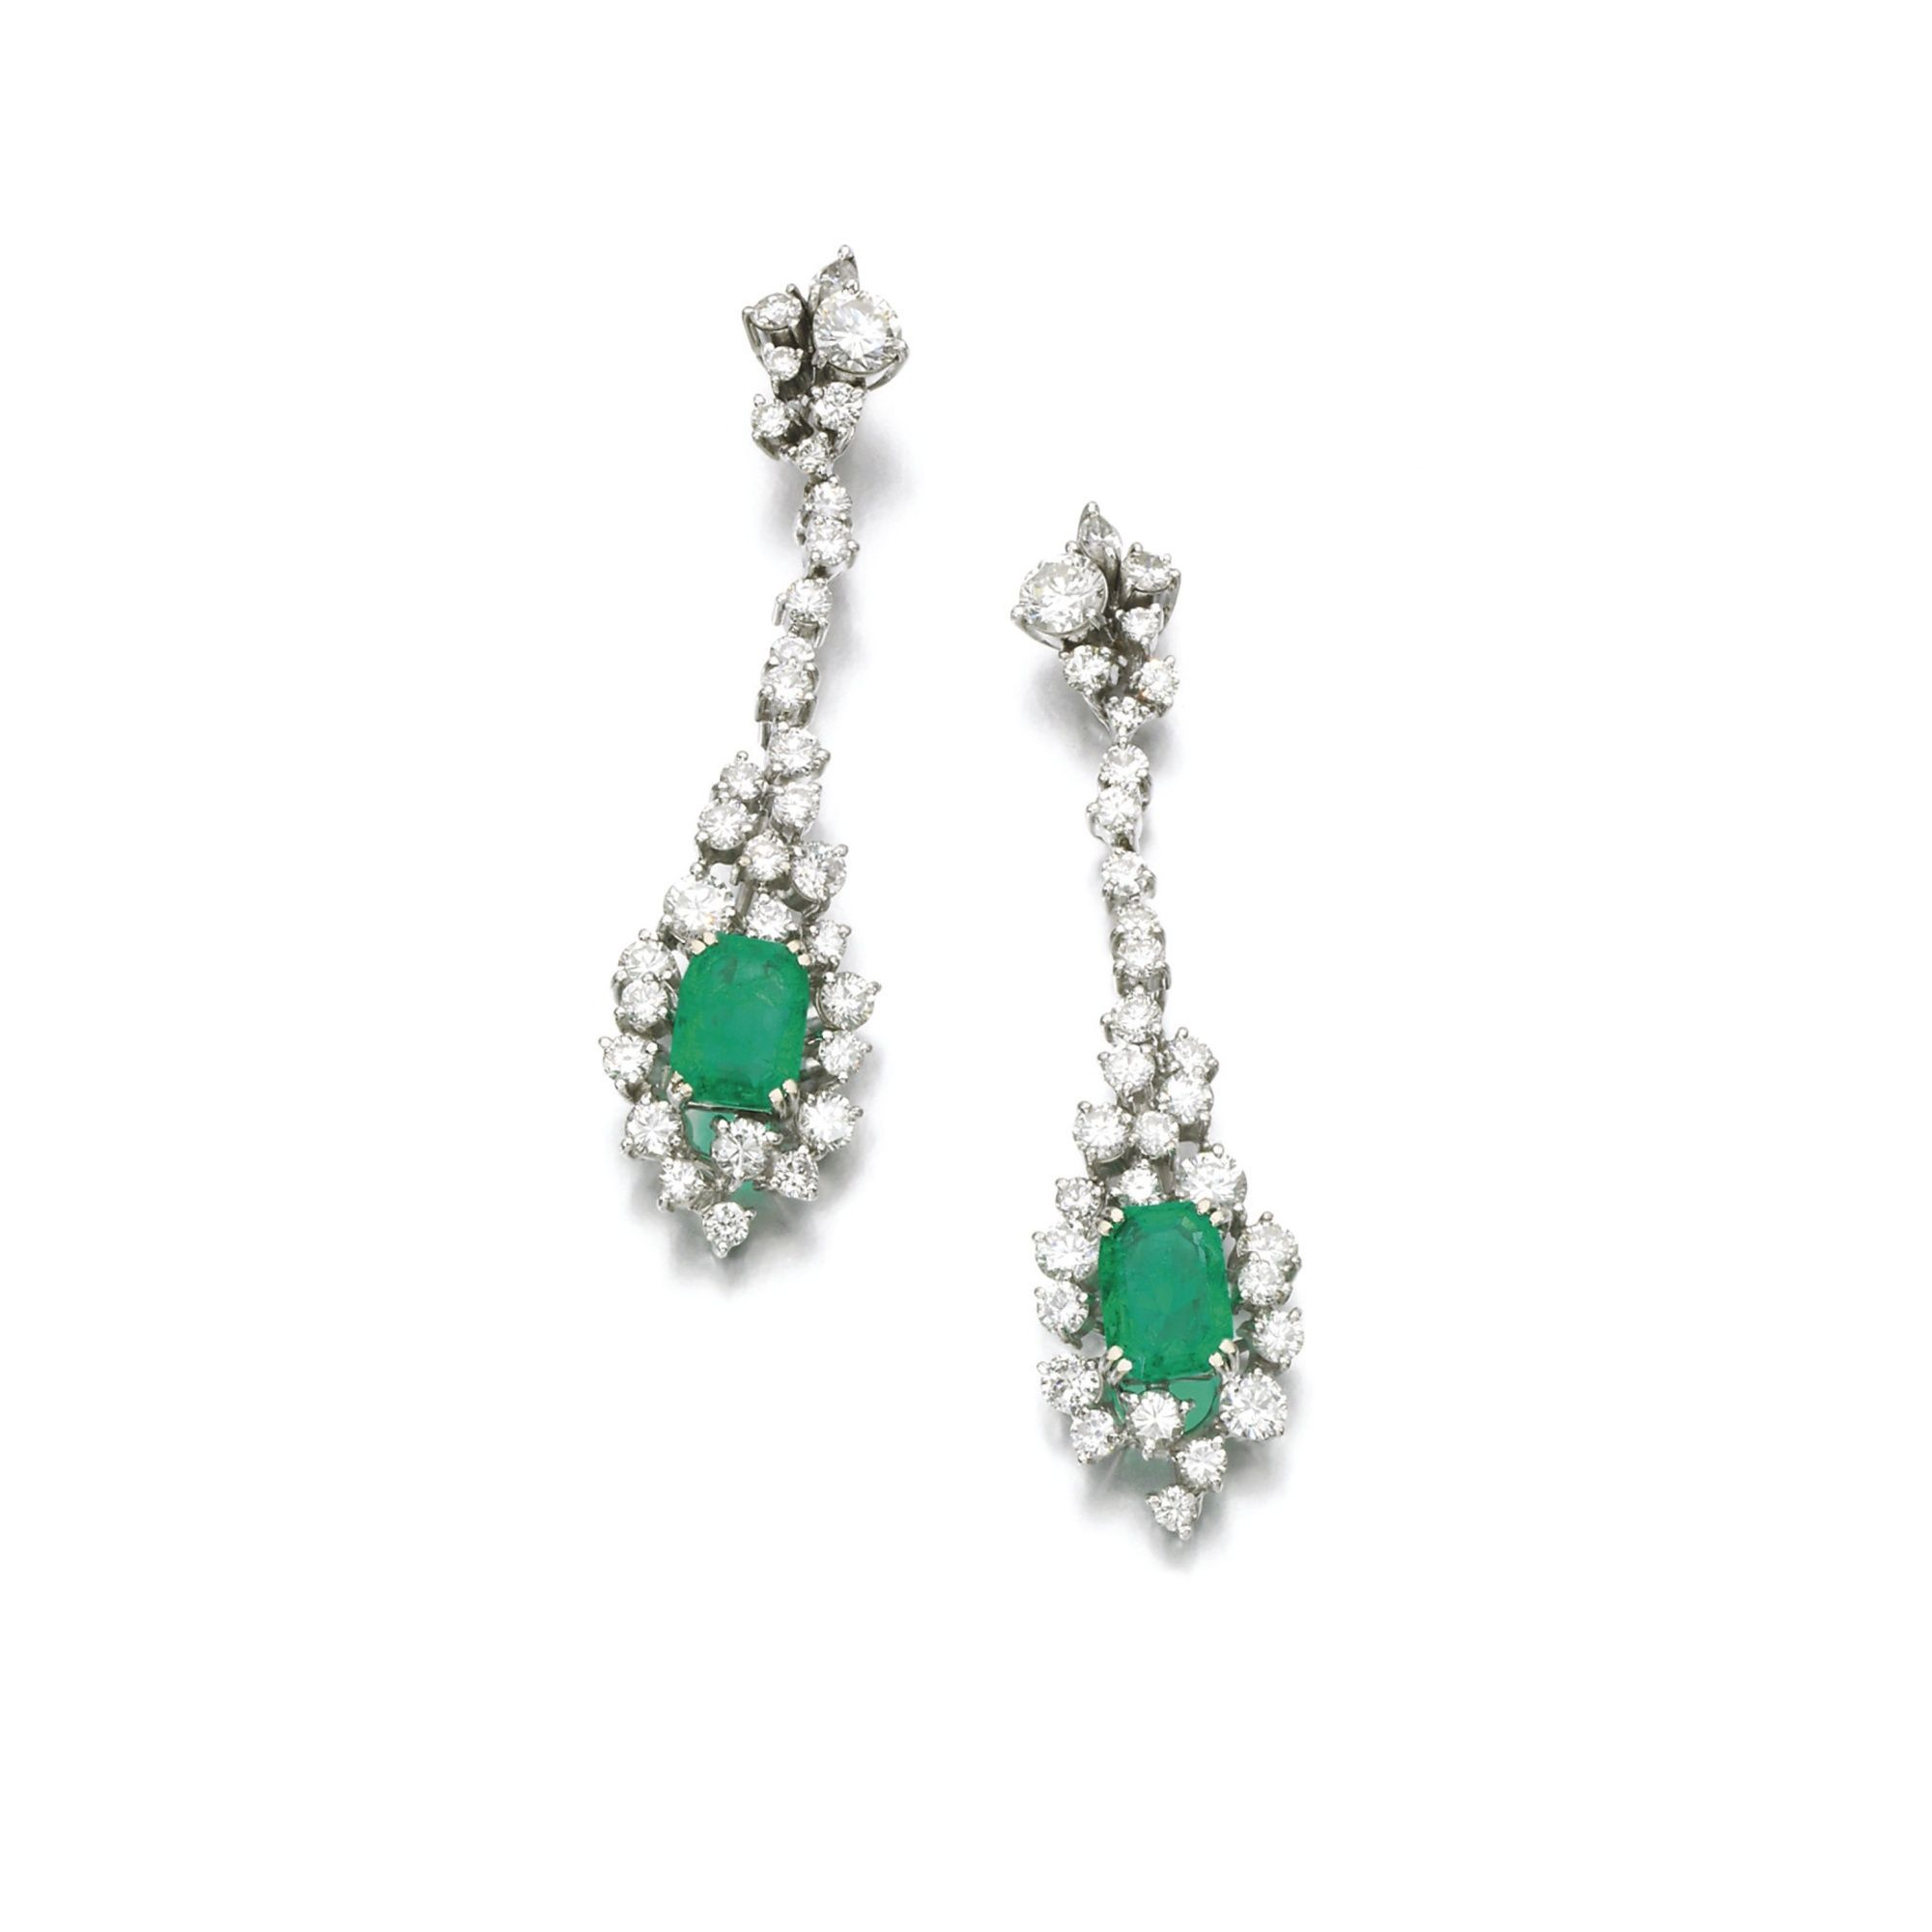 http://www.sothebys.com/en/auctions/ecatalogue/2014/fine-jewels-l14052/lot.152.html